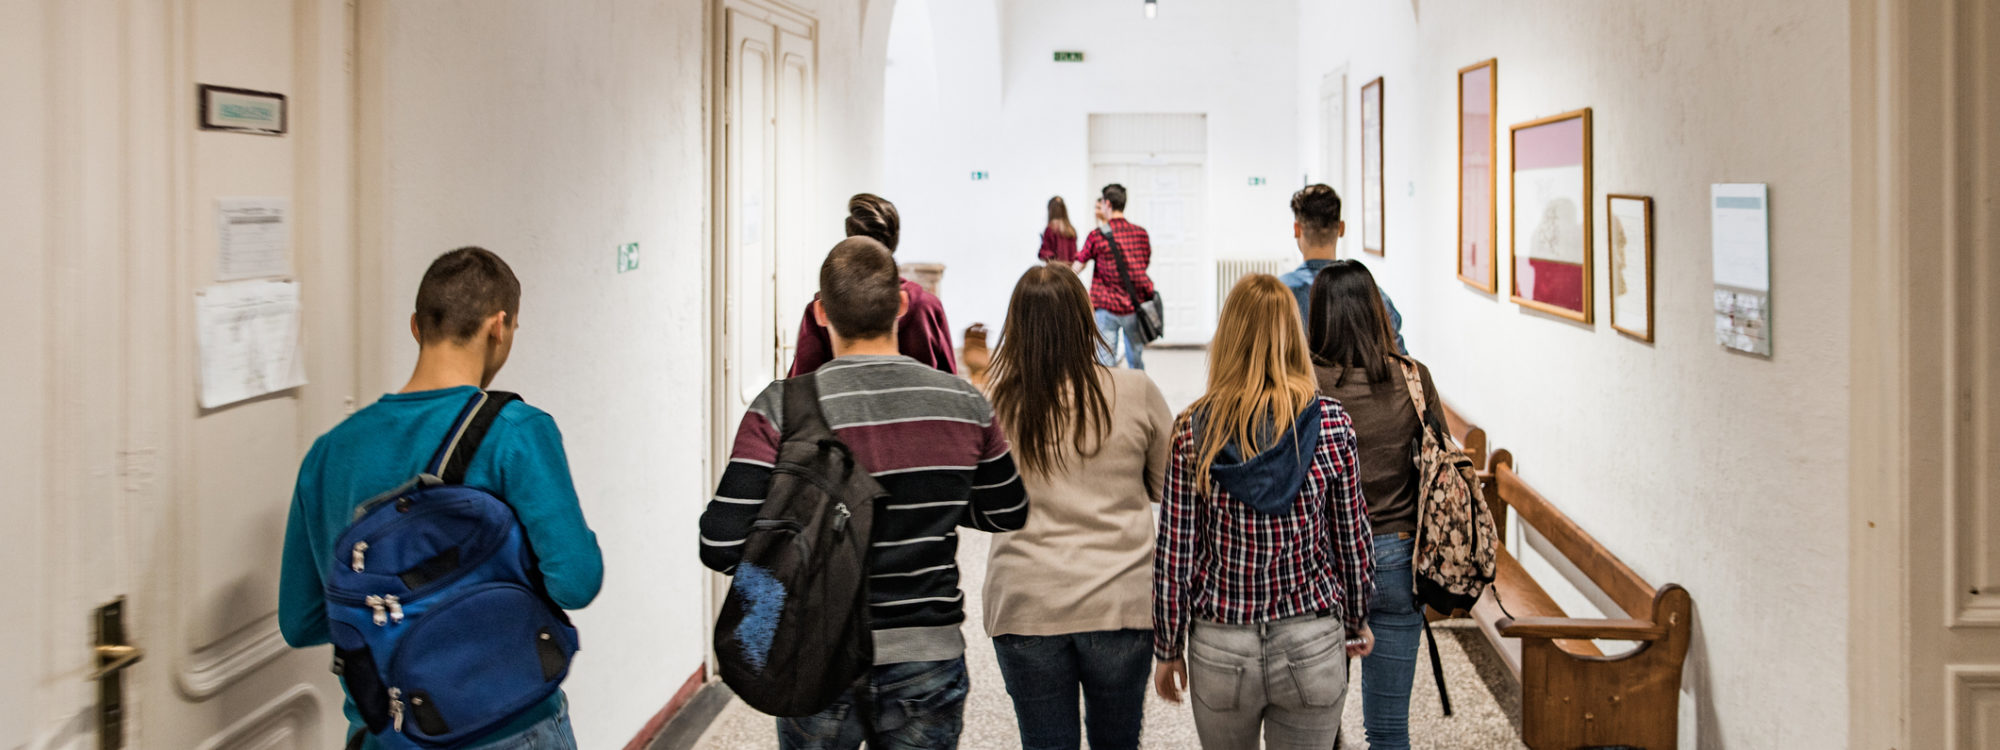 Rear view of high school students walking in the school hallway.